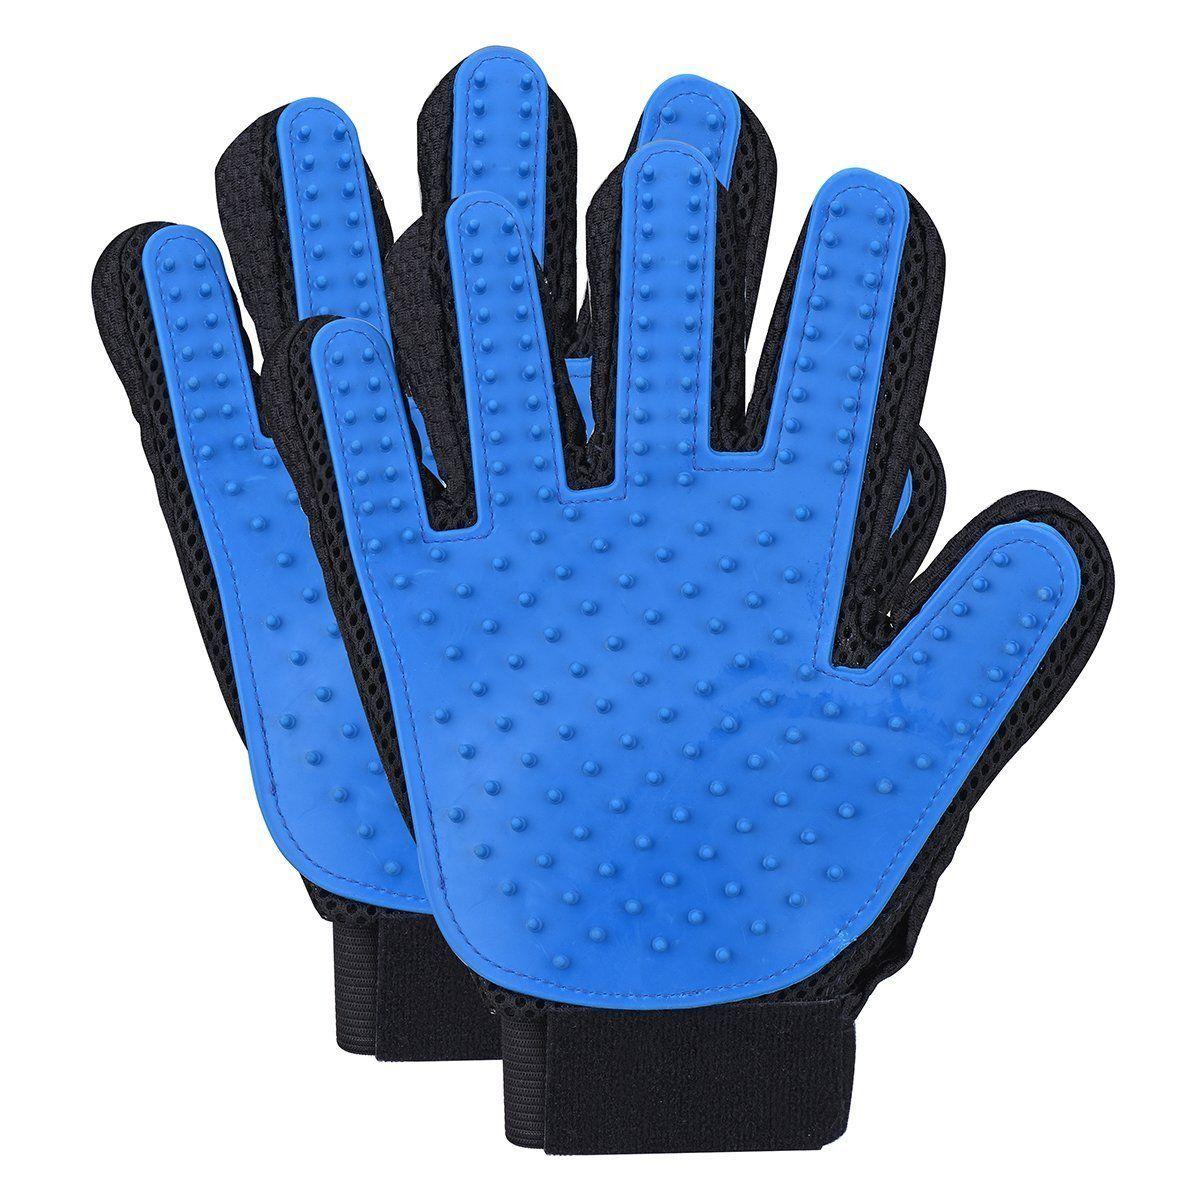 Pack 2 Deshedding Grooming Glove Gentle and Efficient Pet